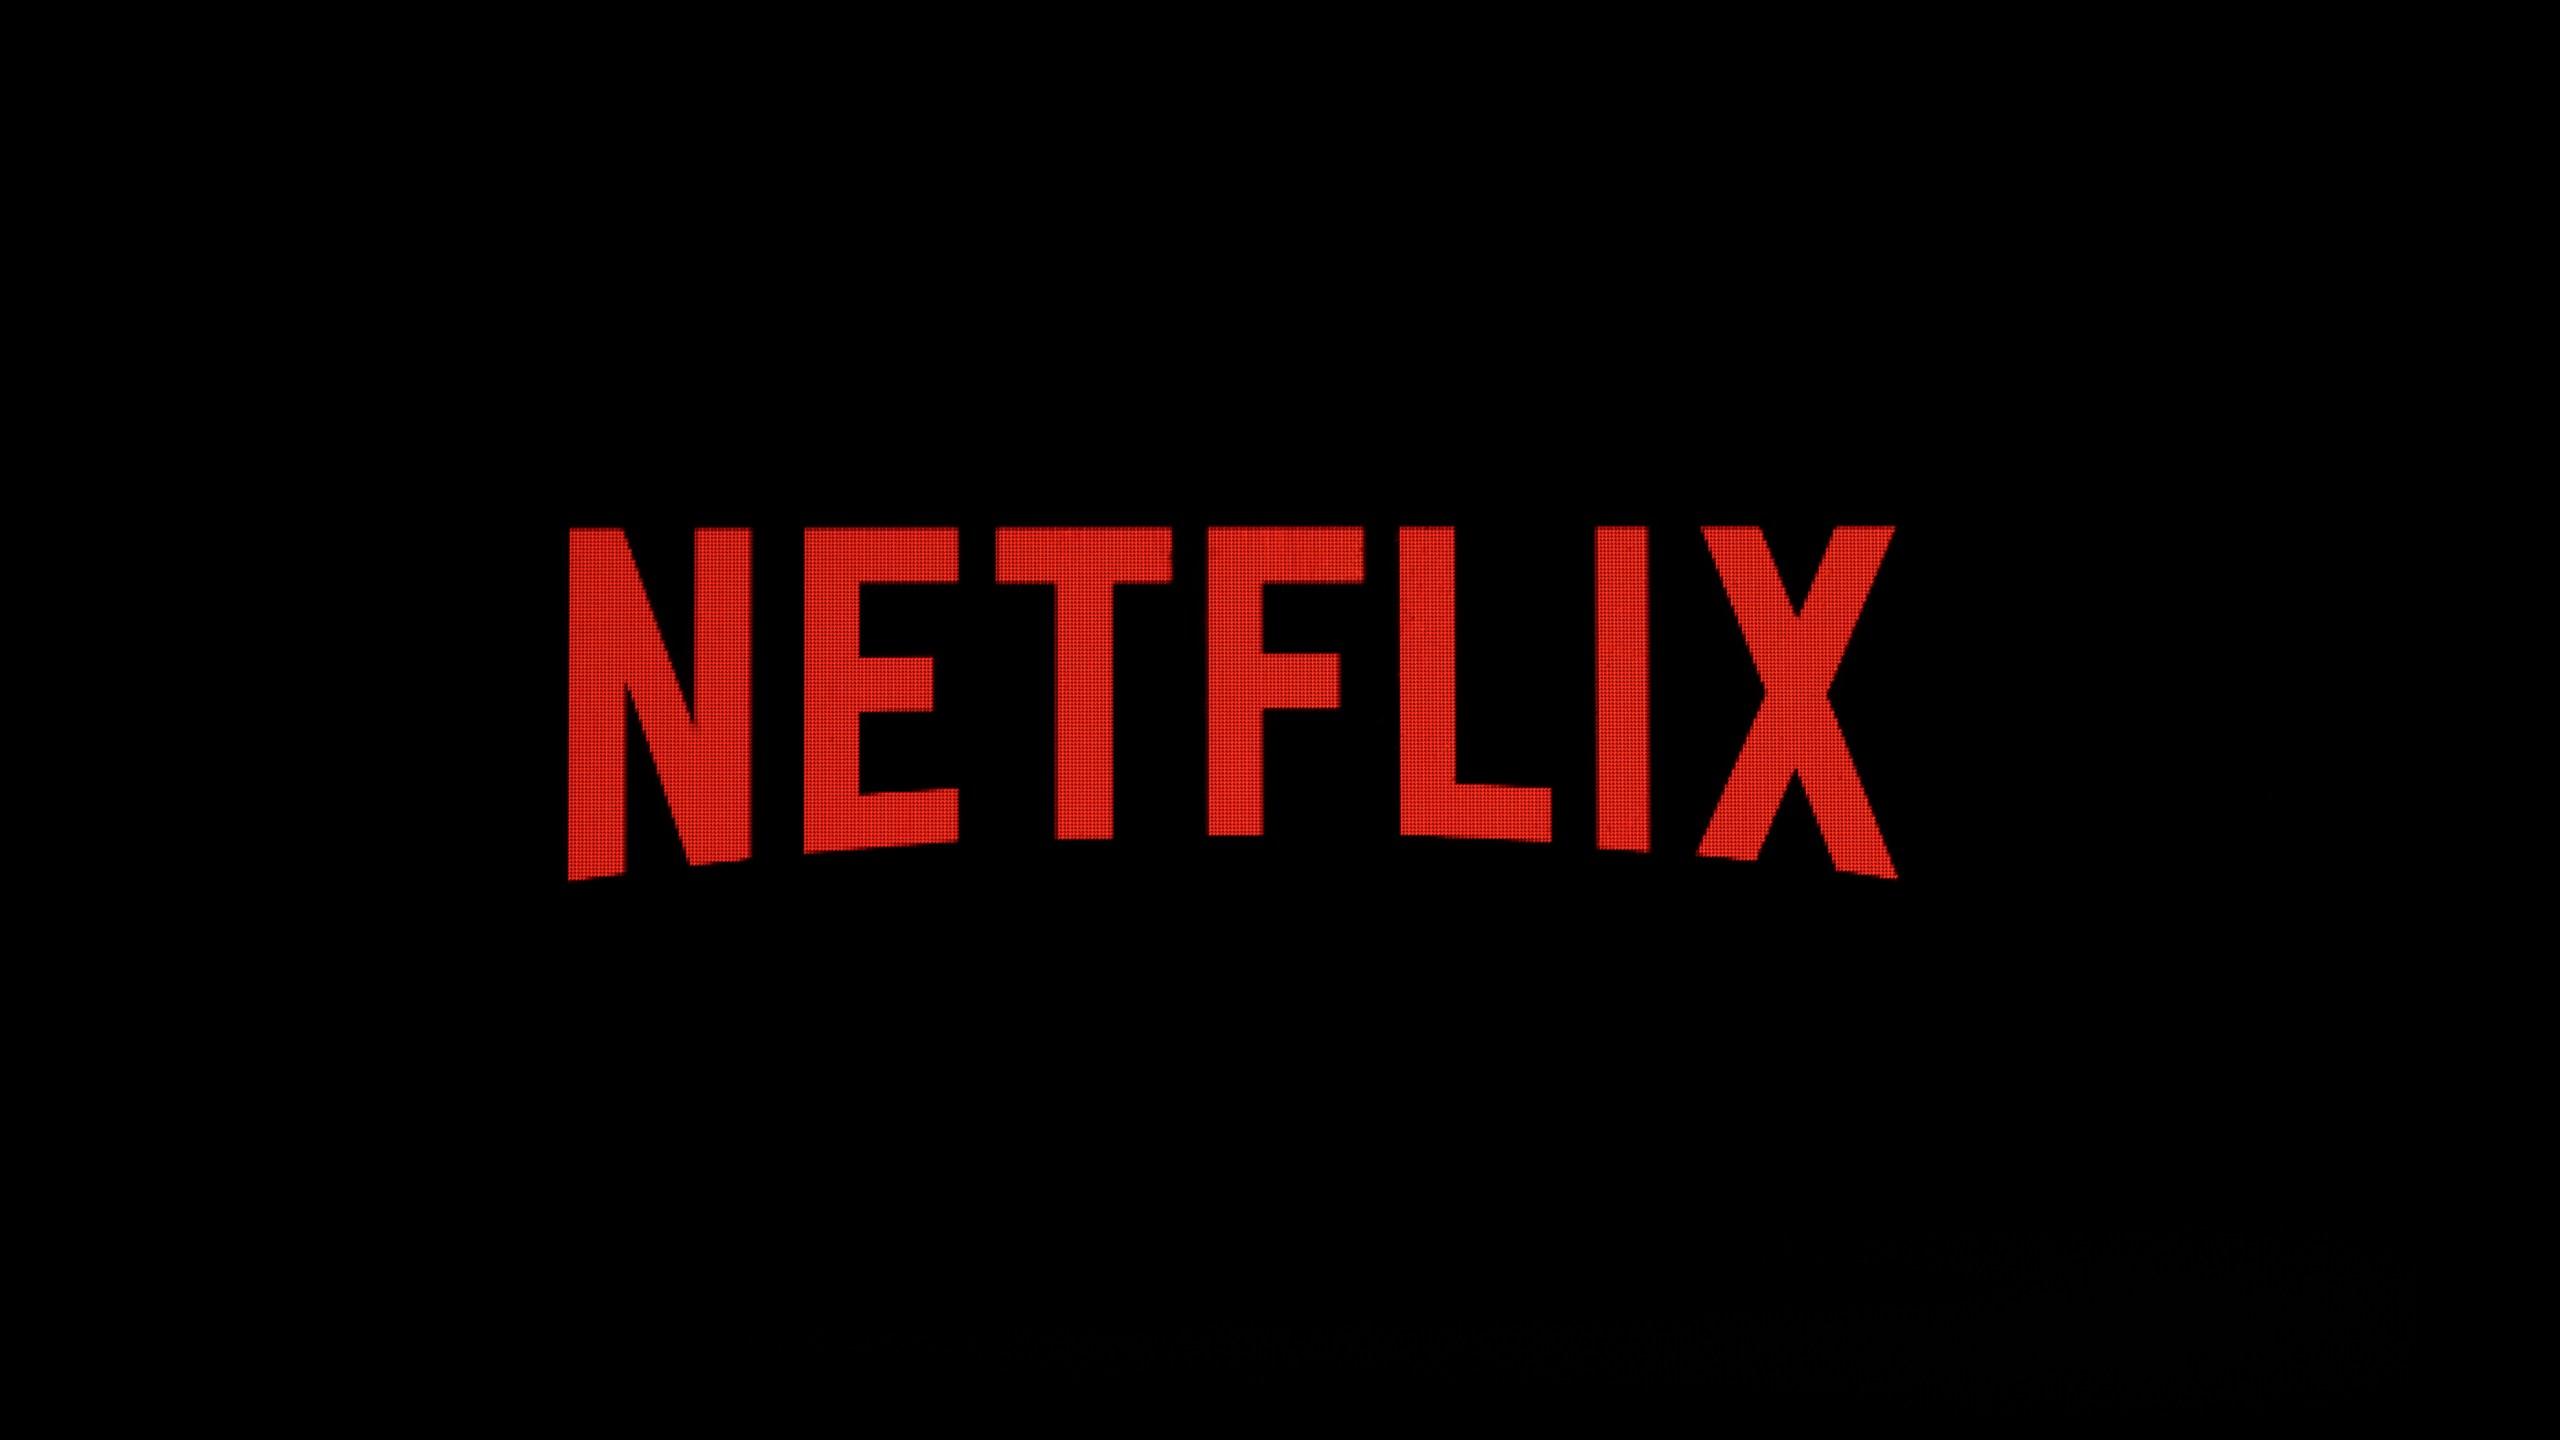 Netflix_Production_Hub_87733-159532.jpg98783801